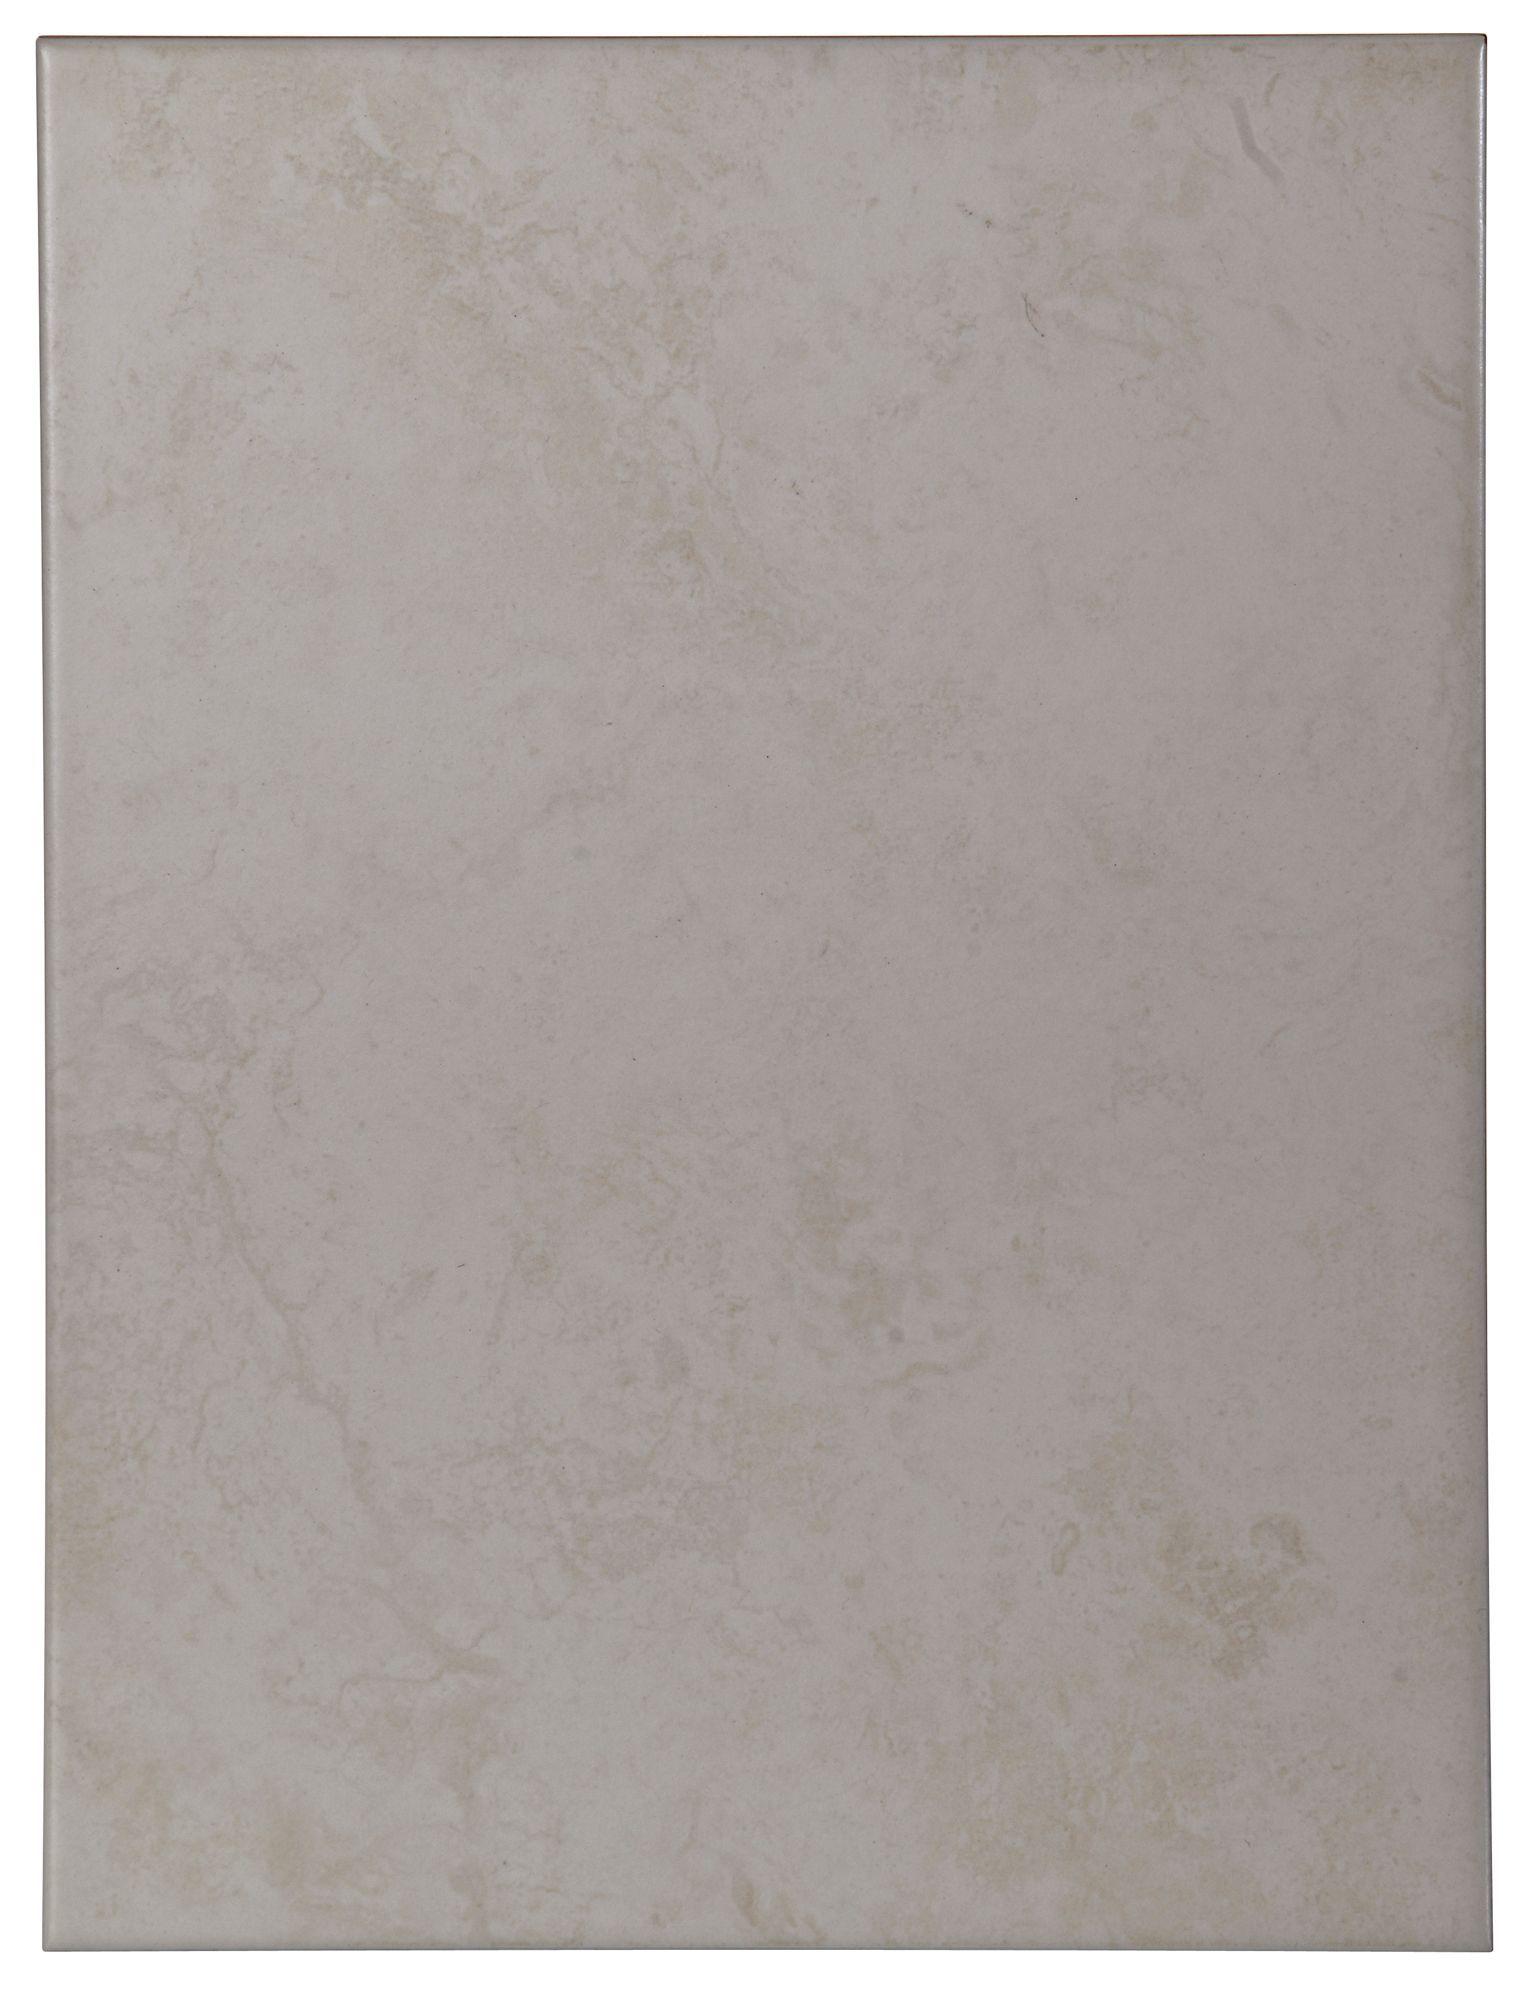 Helena Light Beige Ceramic Wall Tile, Pack Of 12, (l)330mm (w)250mm